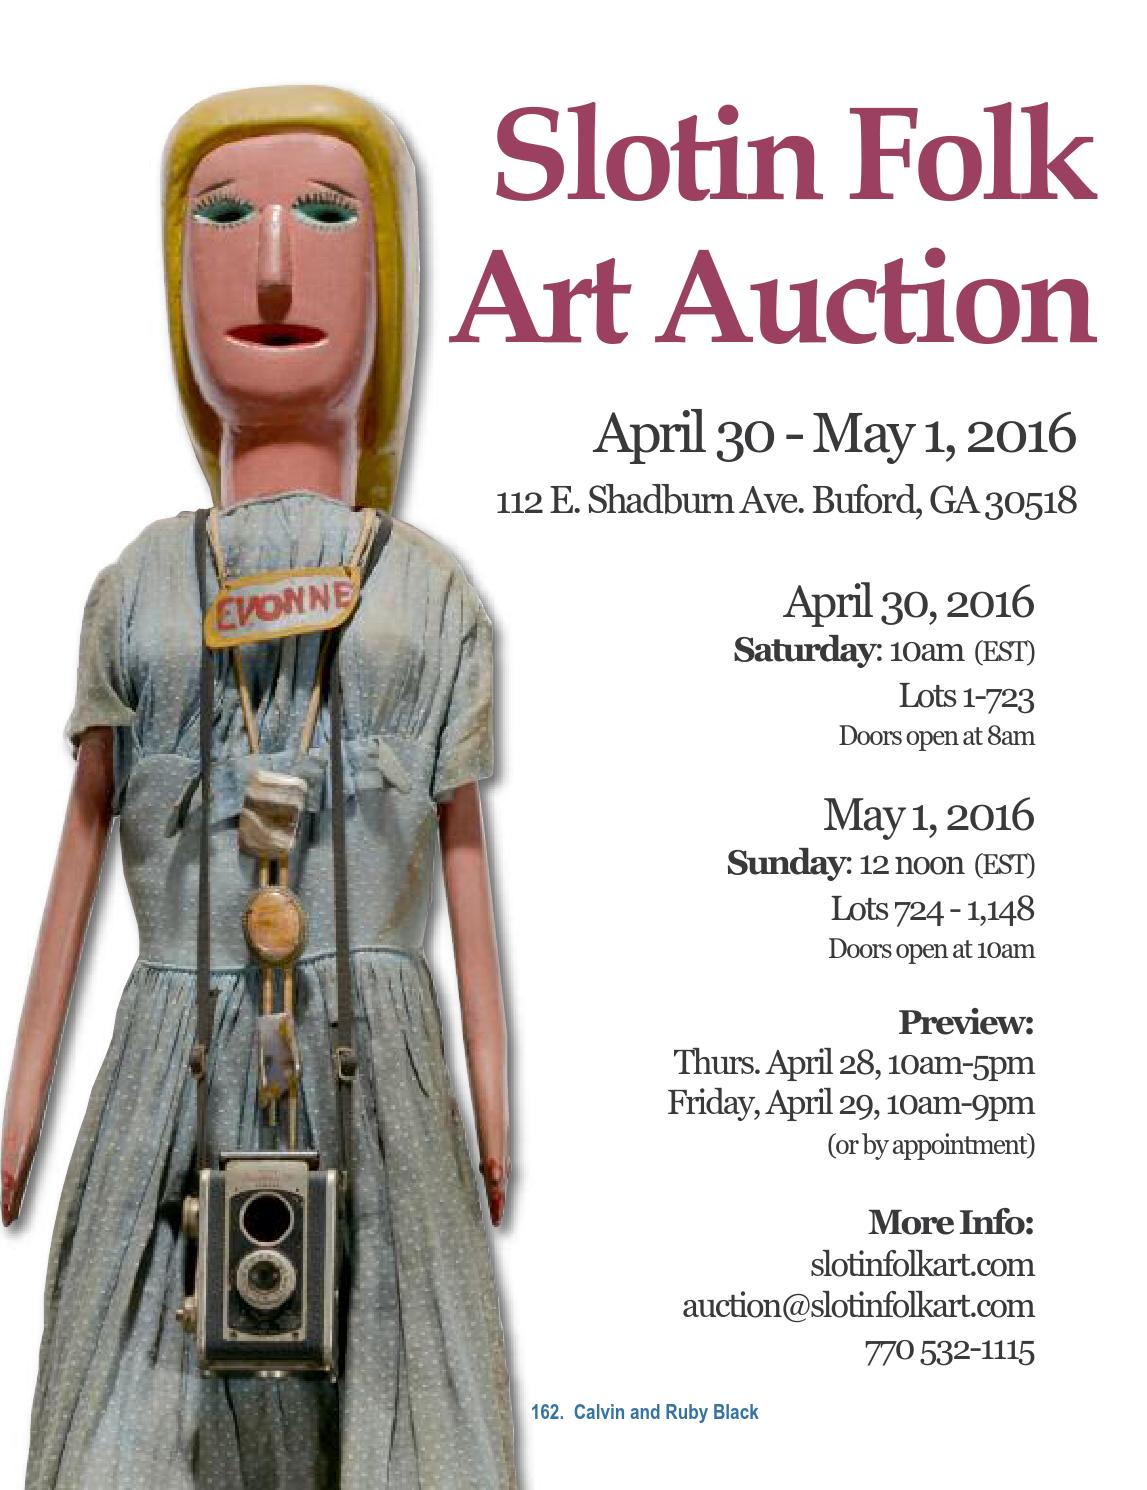 Slotin Folk Art Auction Catalog April 2016 by Slotin Folk Art - issuu